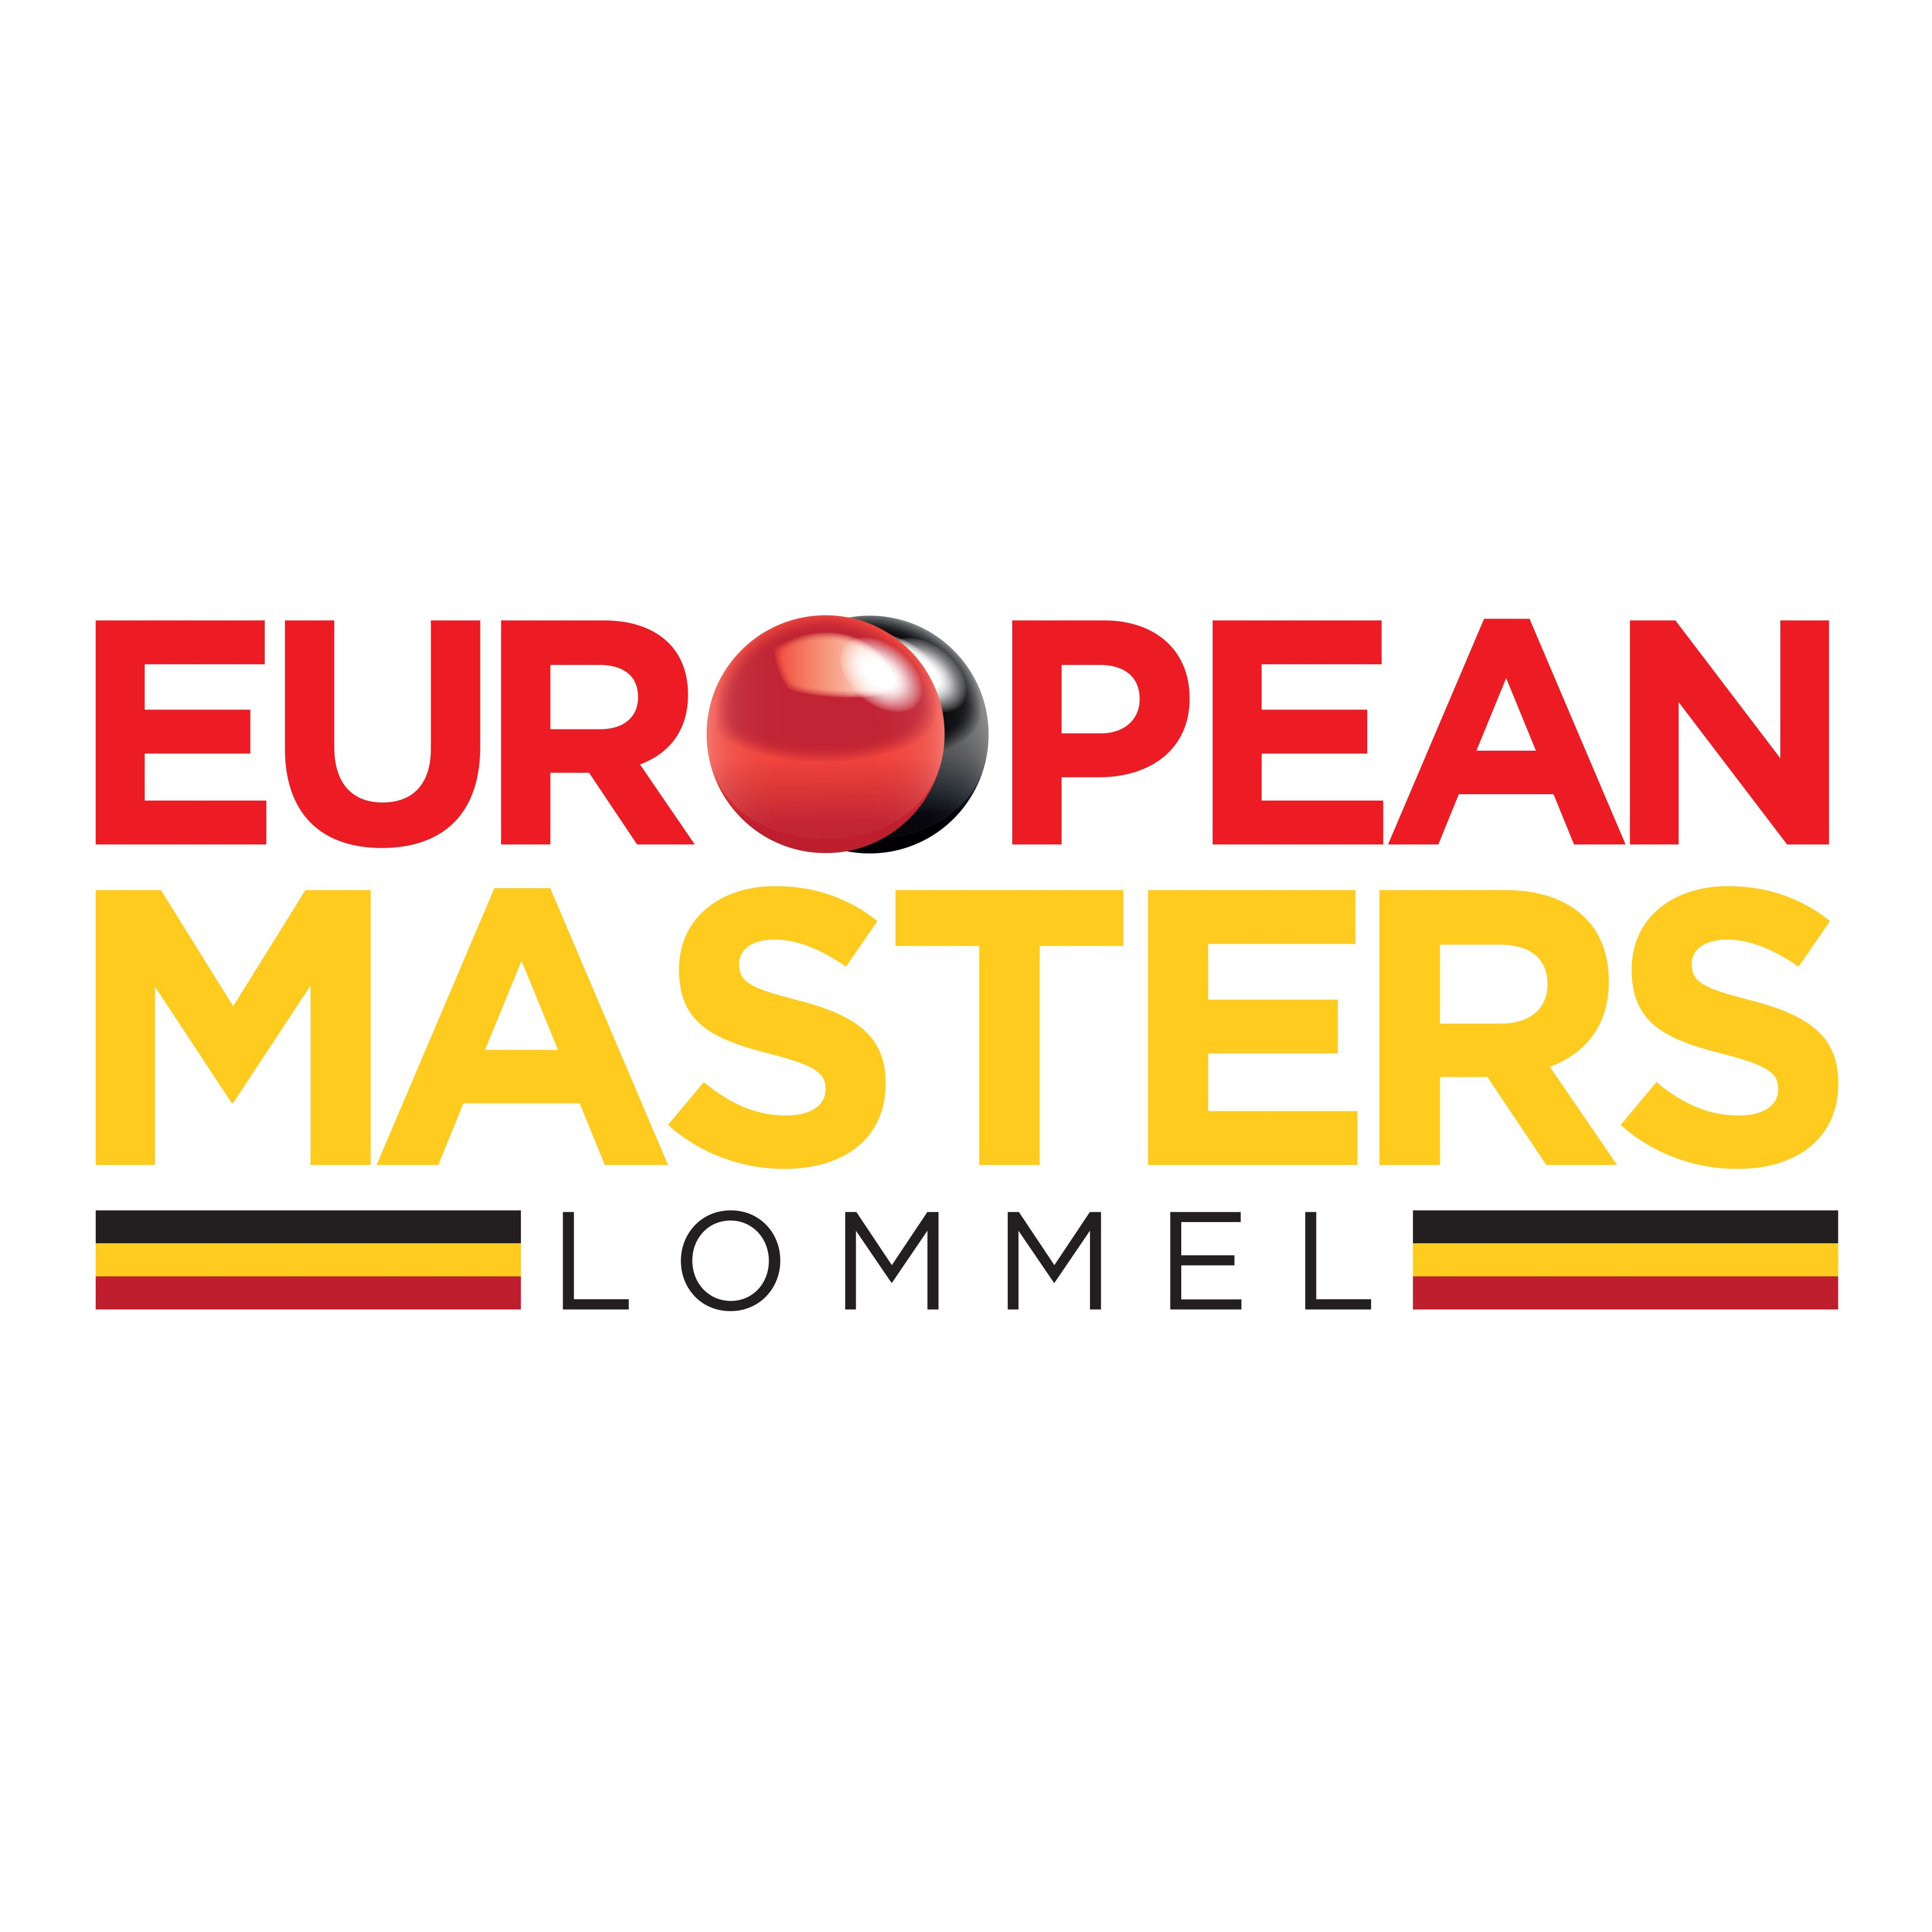 2018 World Snooker Ranking Event - European Masters